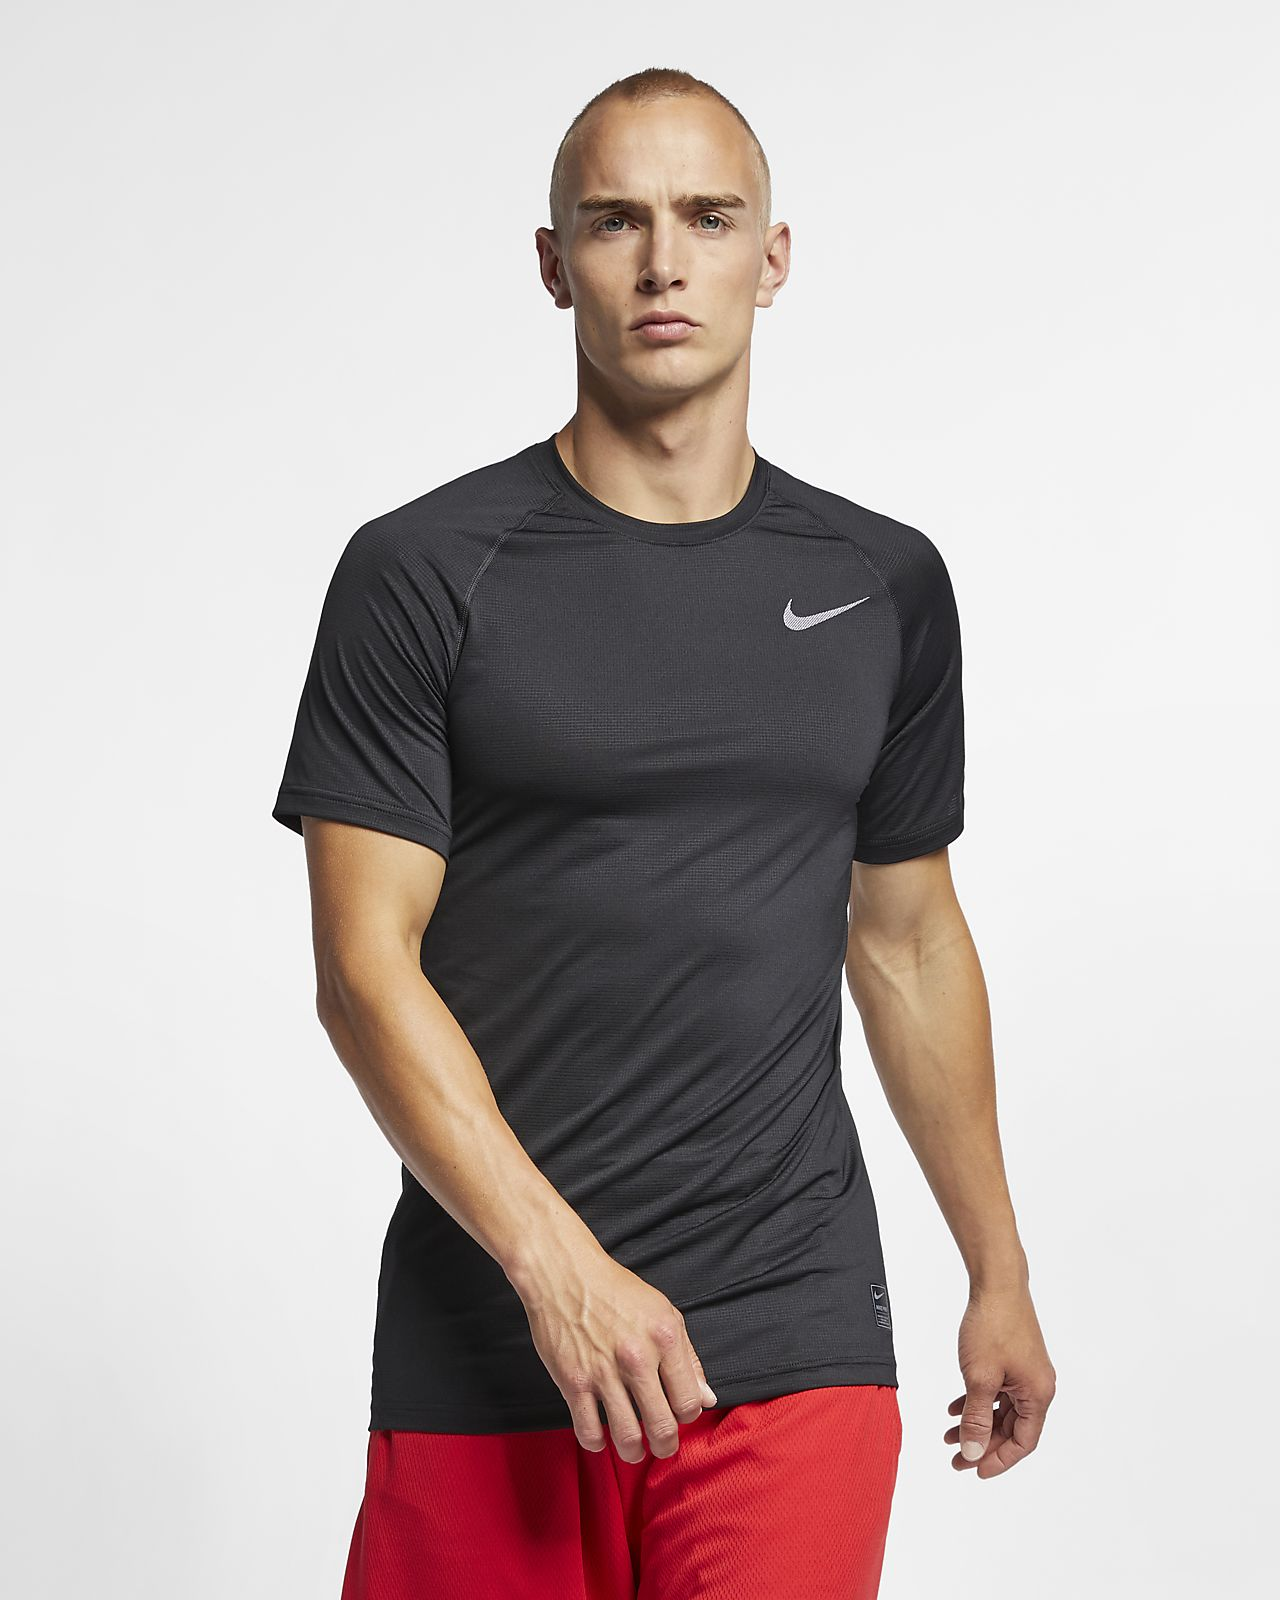 Nike Breathe Pro Camiseta de manga corta - Hombre